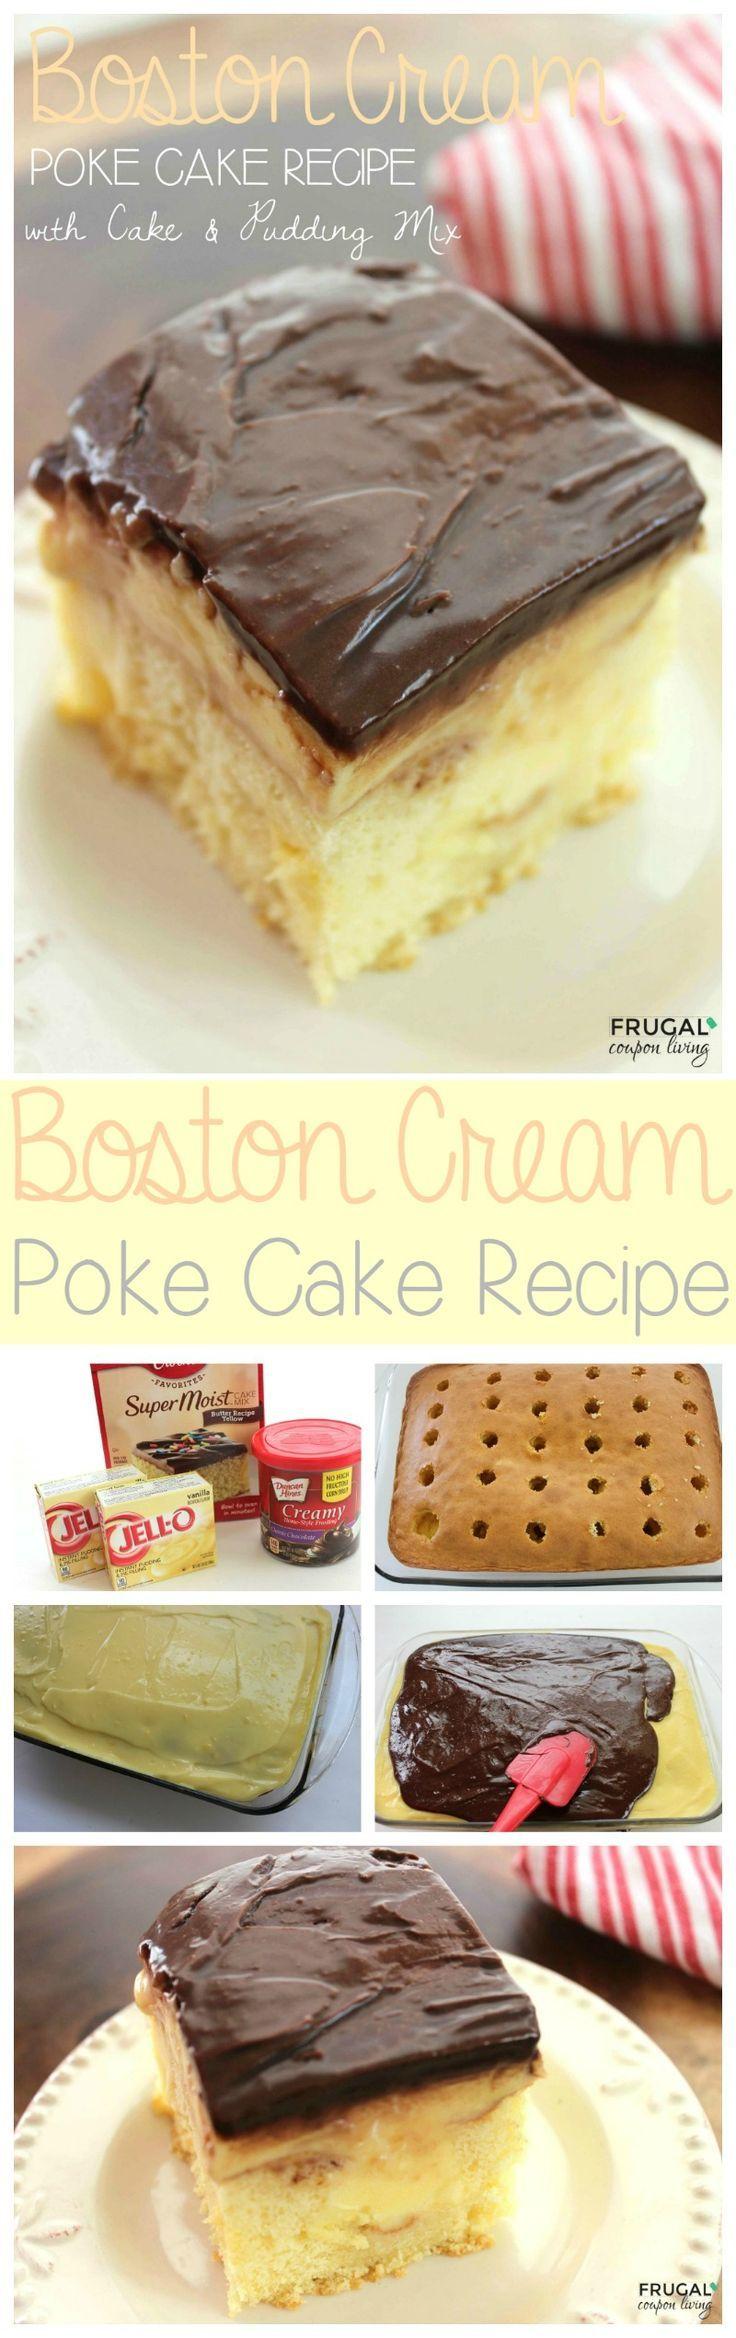 Boston Cream Poke Cake Recipe Diy Crafts Pinterest